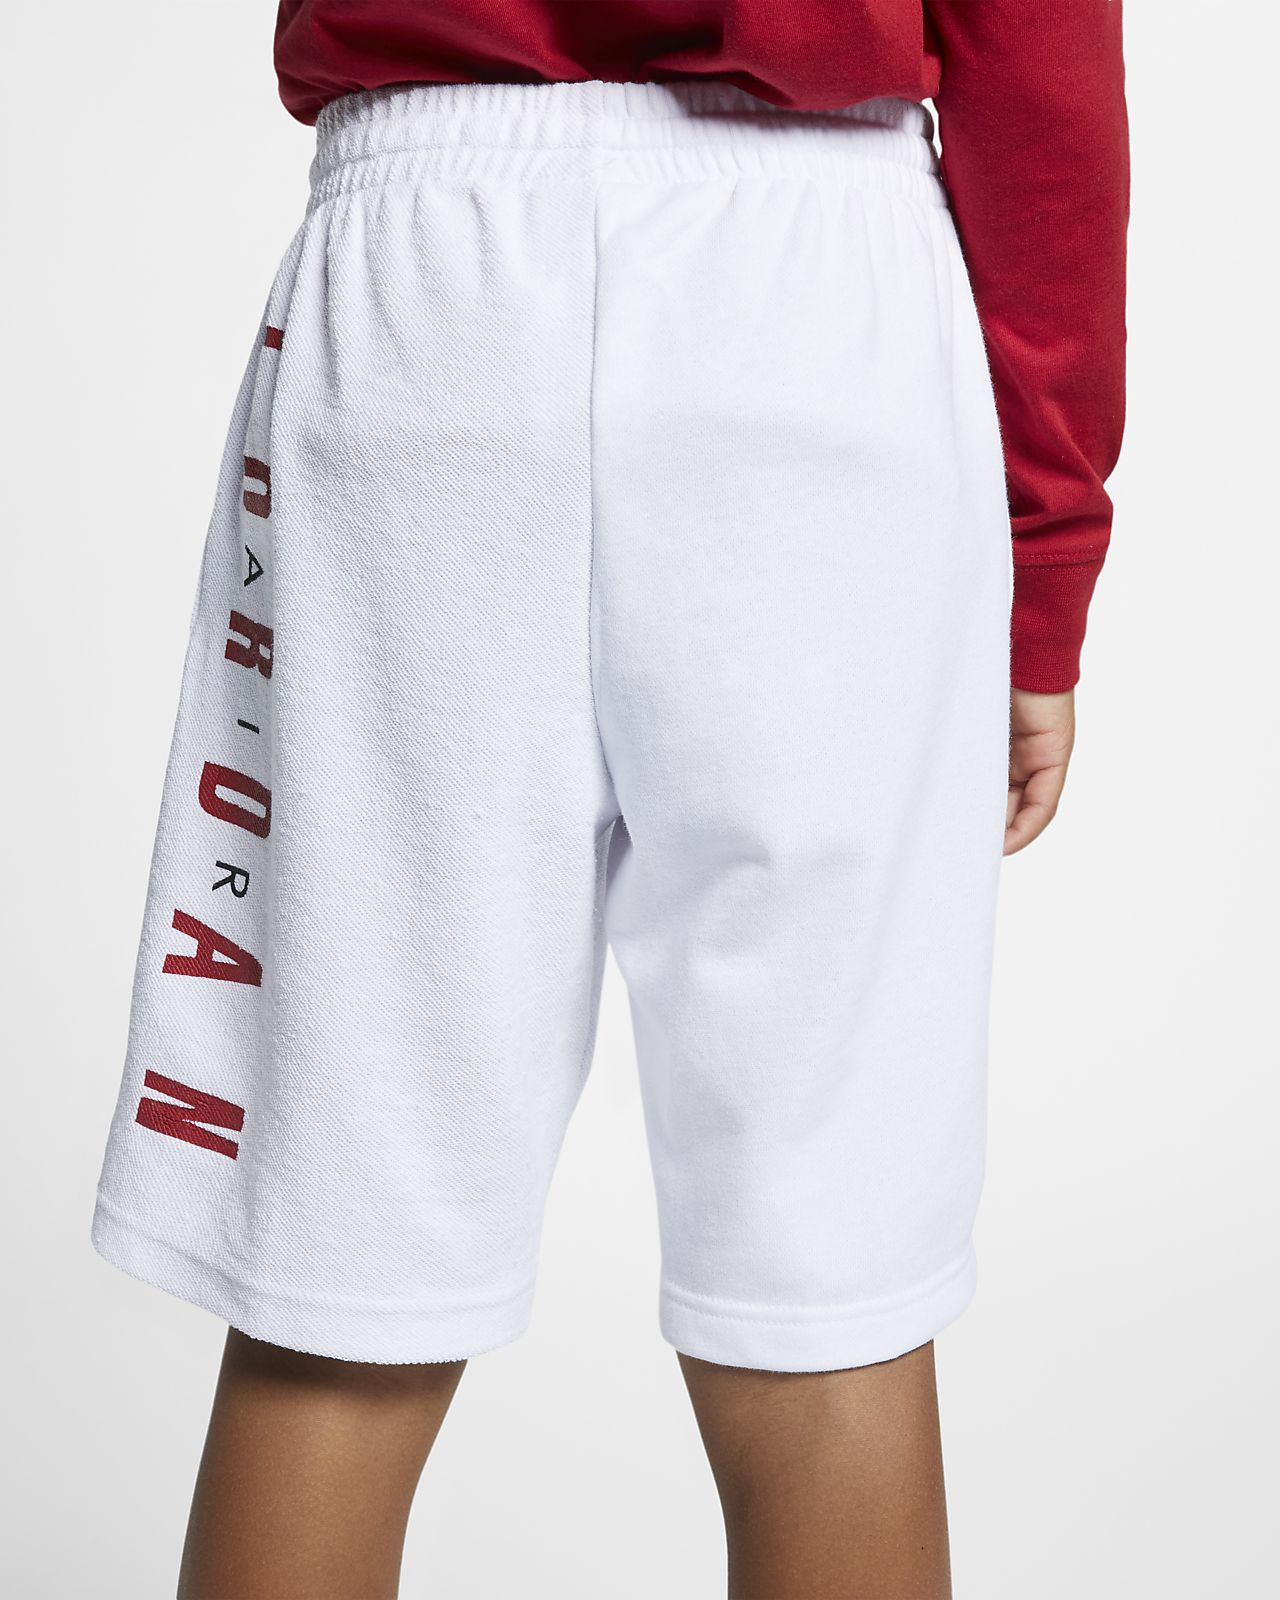 081140f1bfbca6 Jordan Wings Big Kids  (Boys ) Shorts. Nike.com